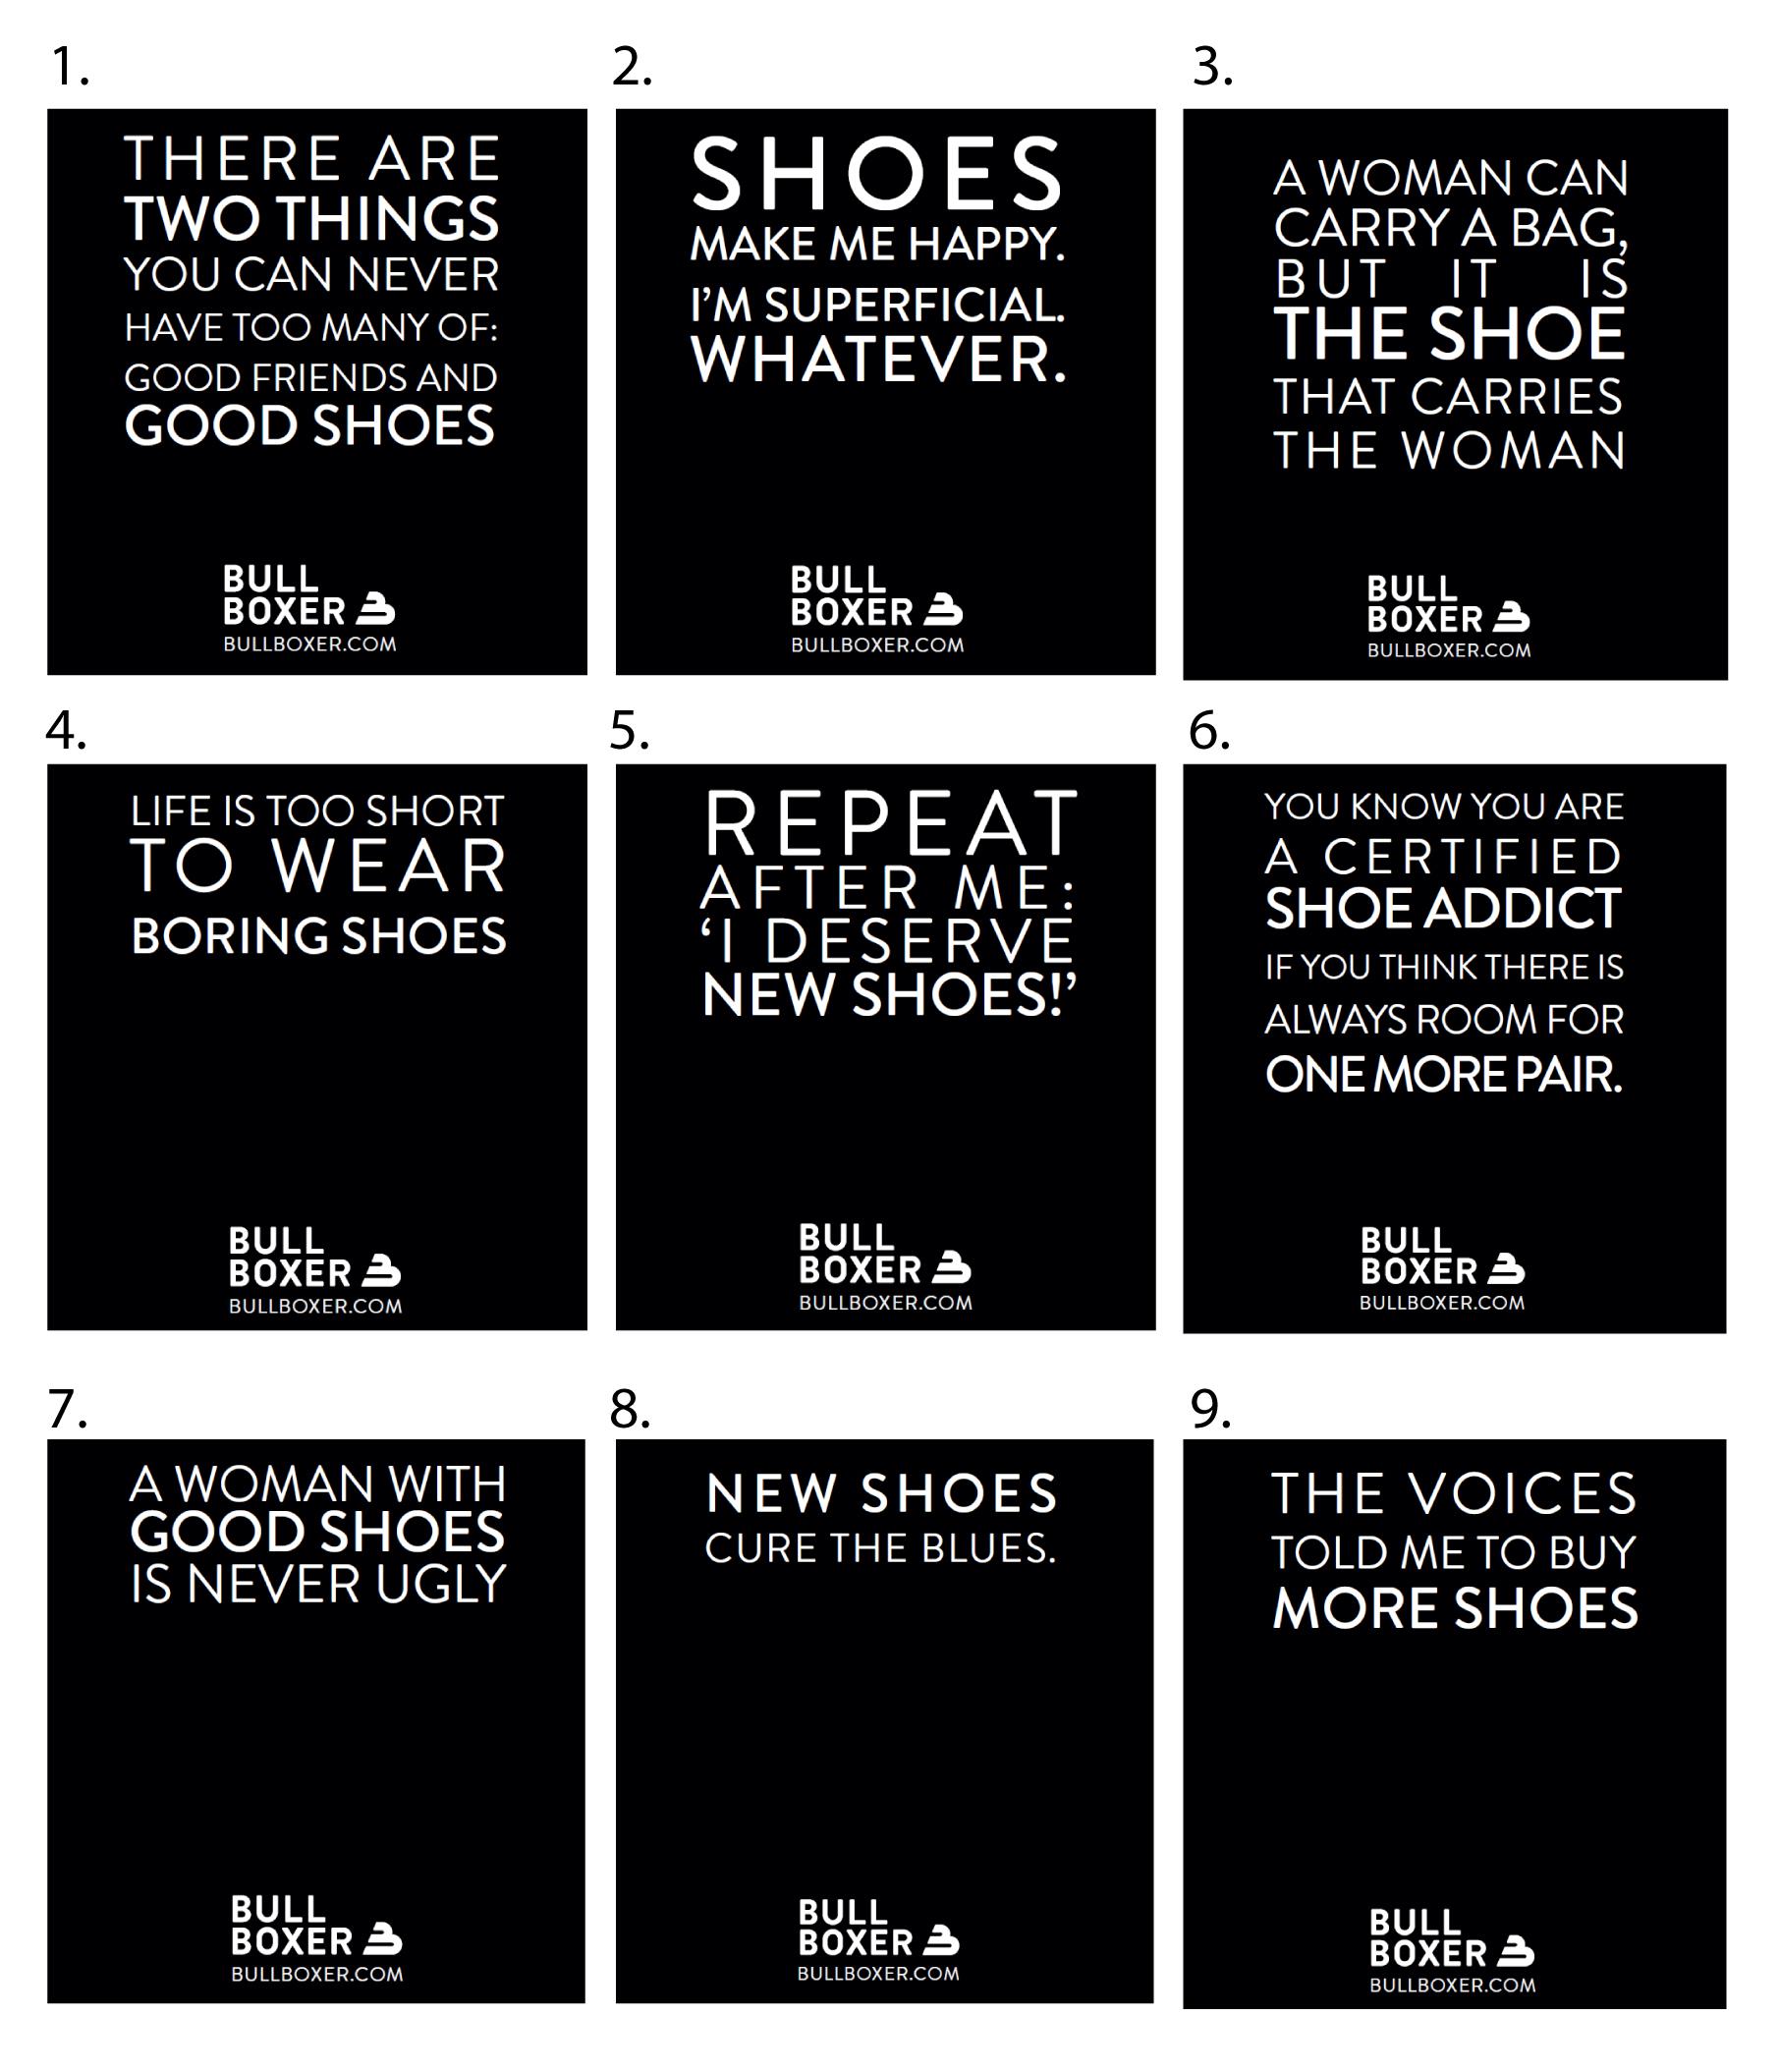 Shoe quote #3